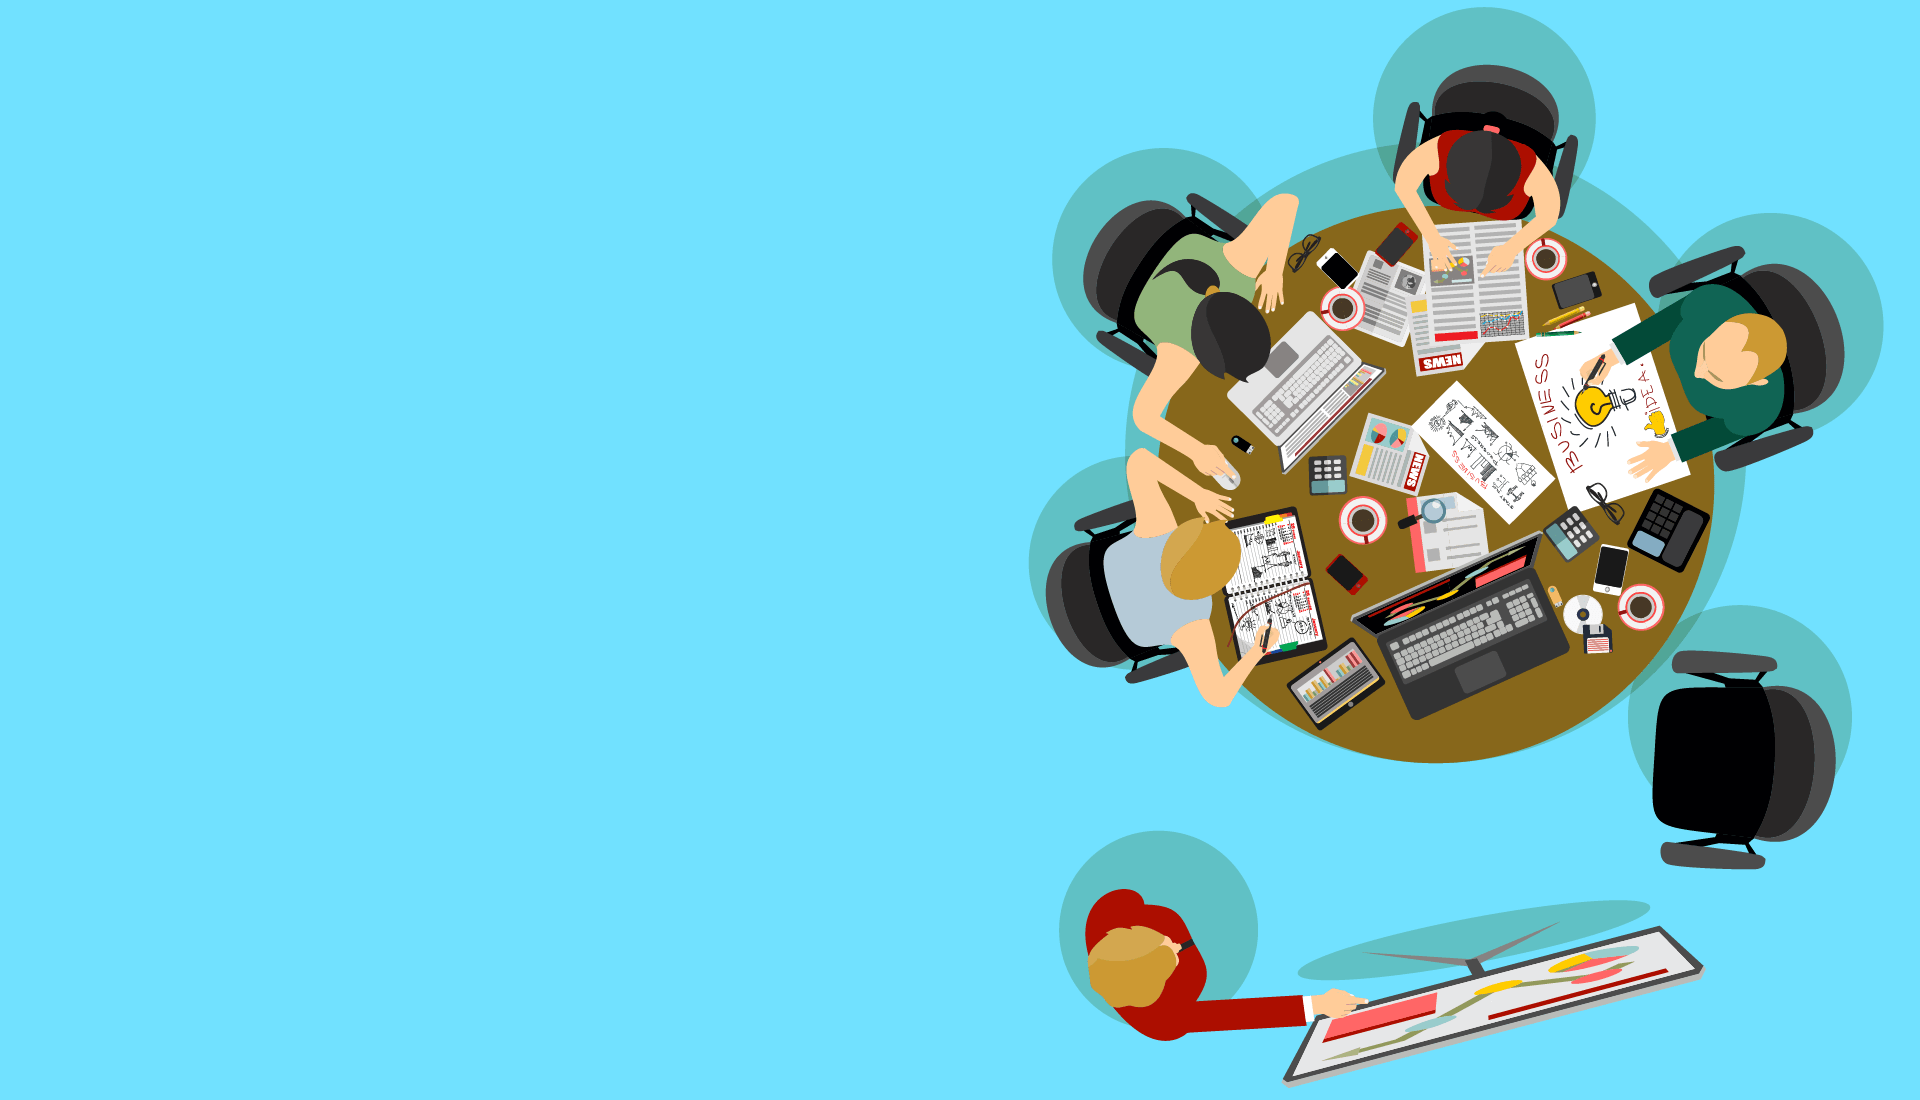 E-COMMERCE & OMNICHANNEL